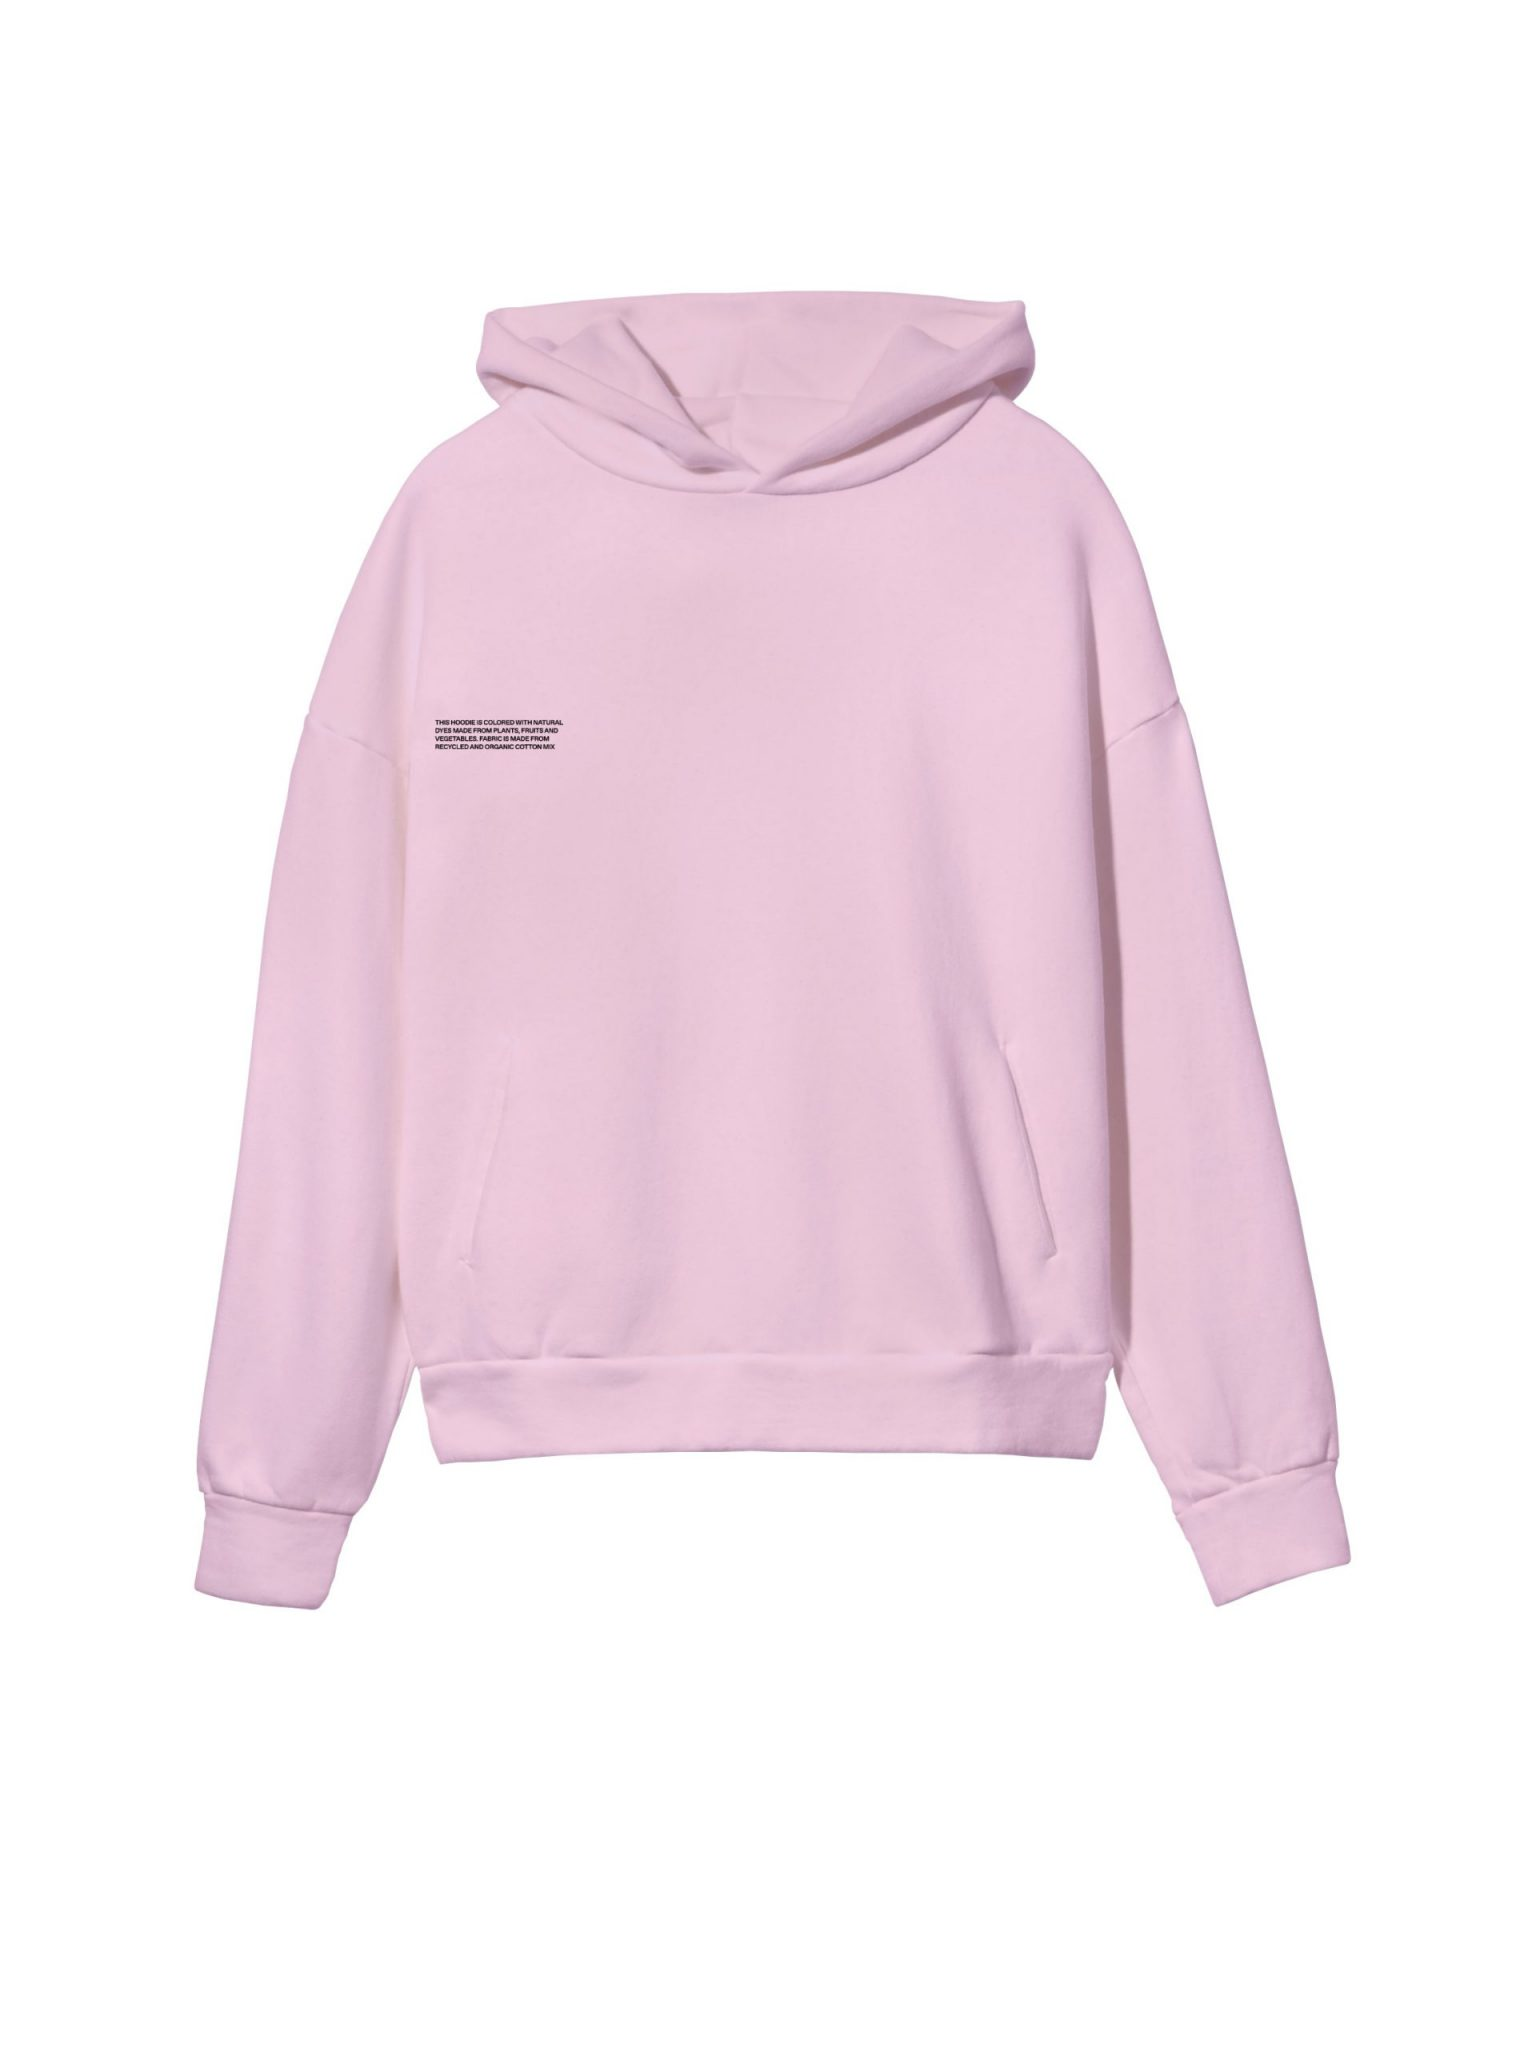 pangaia_still_life_pink_hoodie_front_botanical@3x